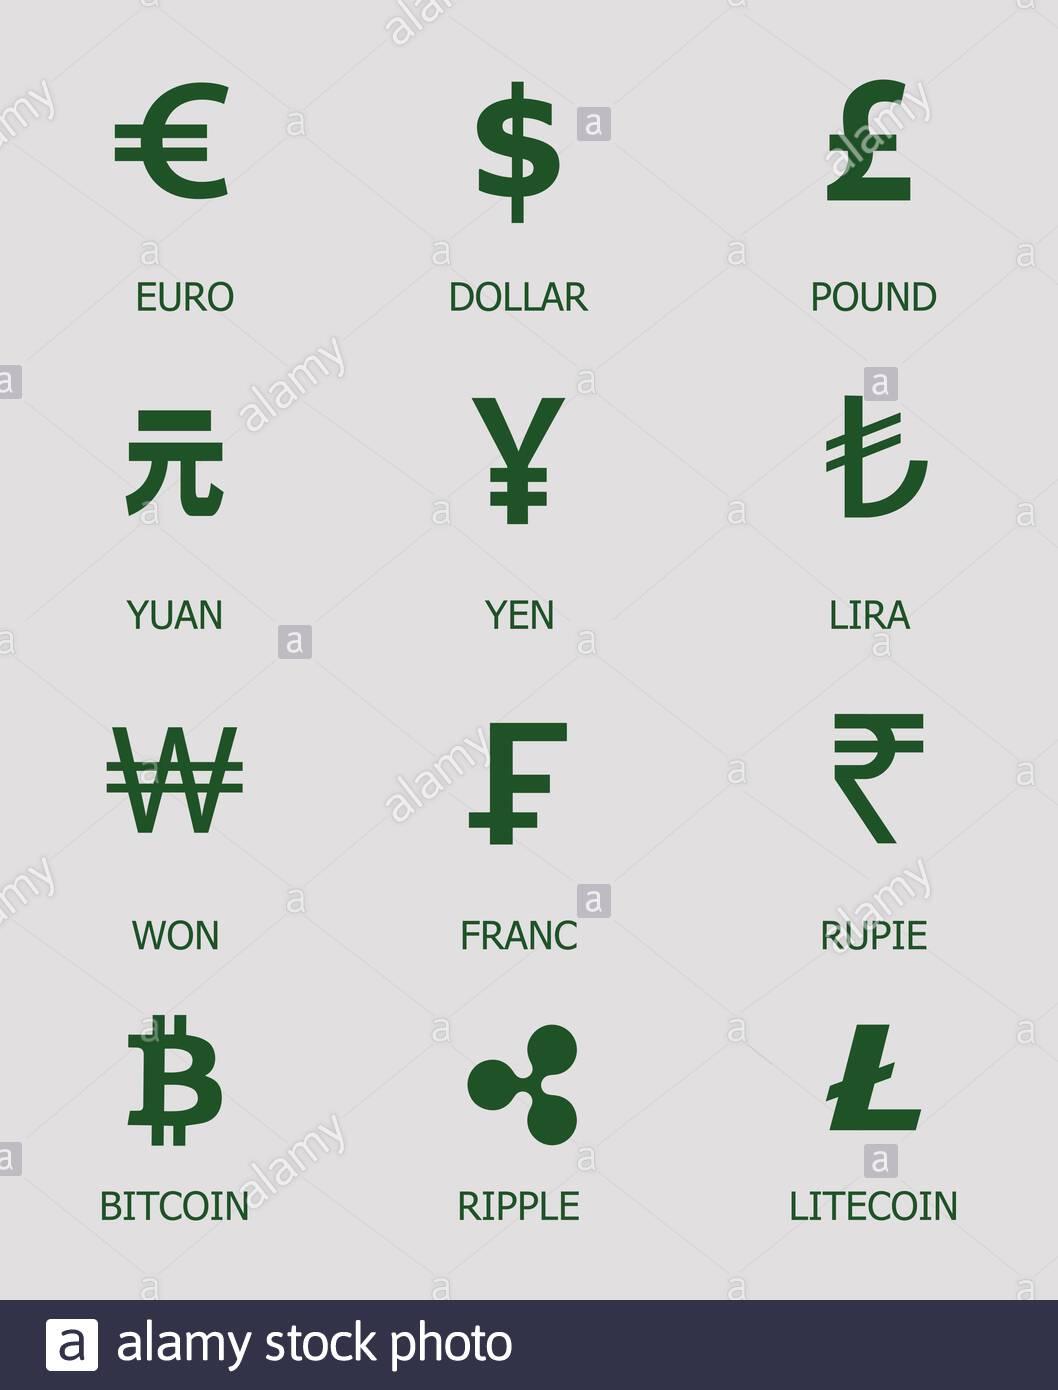 Cryptocurrency symbols on dollar tambourkorps bettinghausen